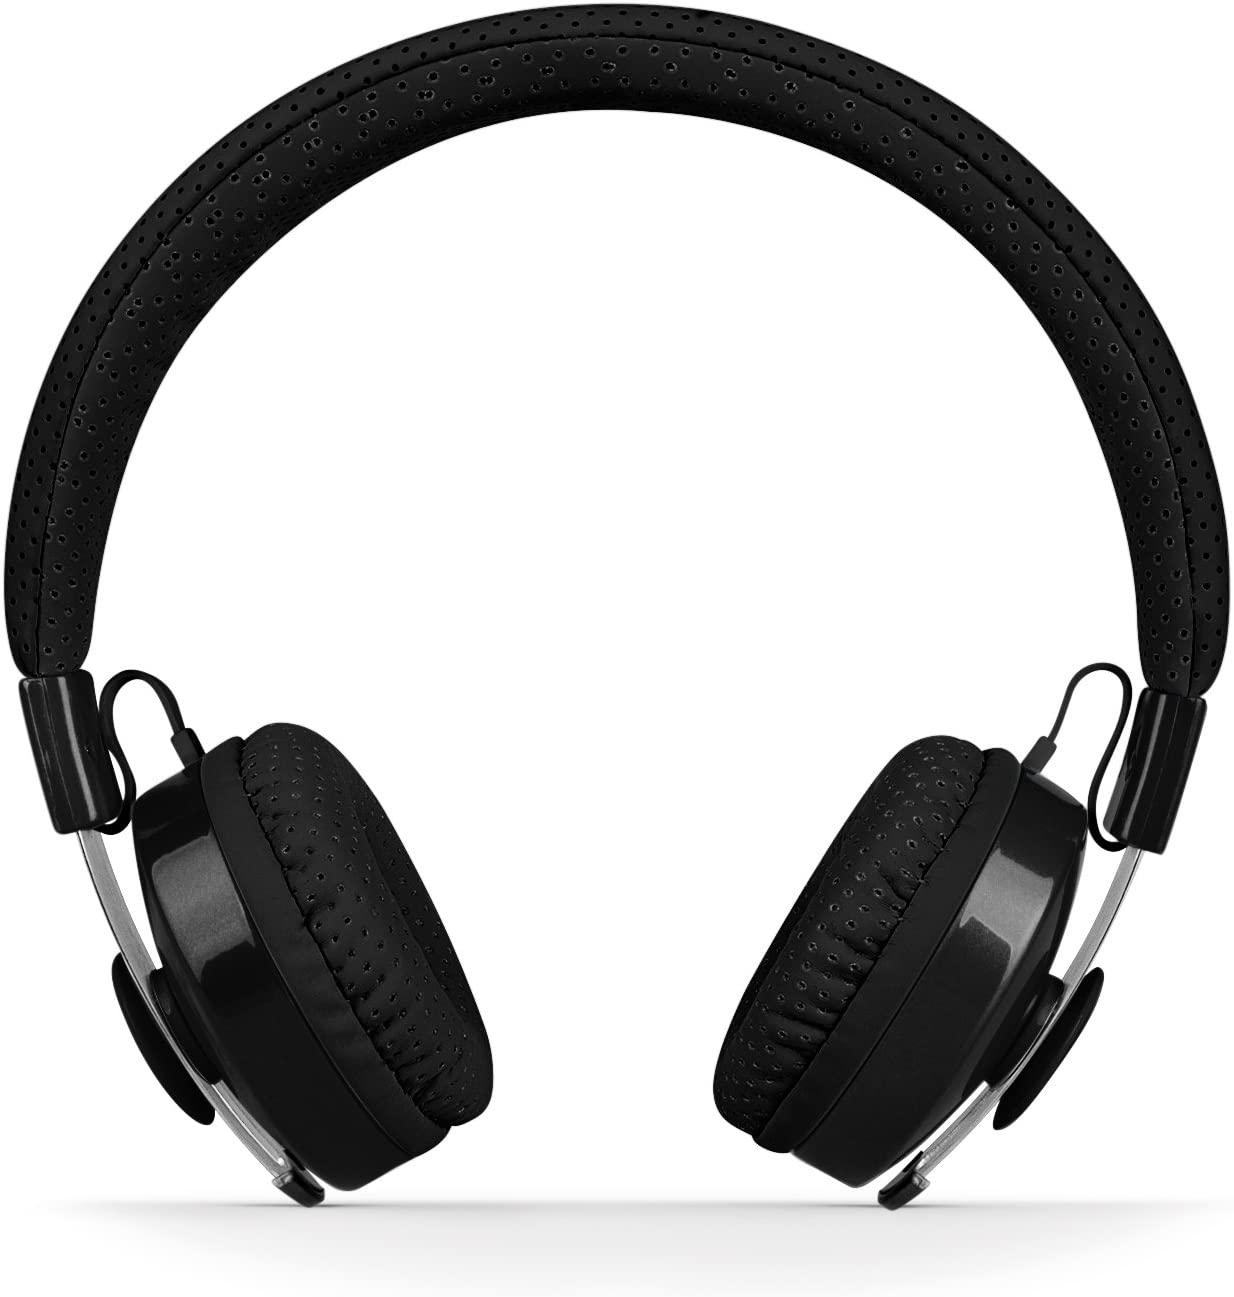 6: LilGadgets Untangled Pro Premium Children's Wireless Bluetooth Headphones